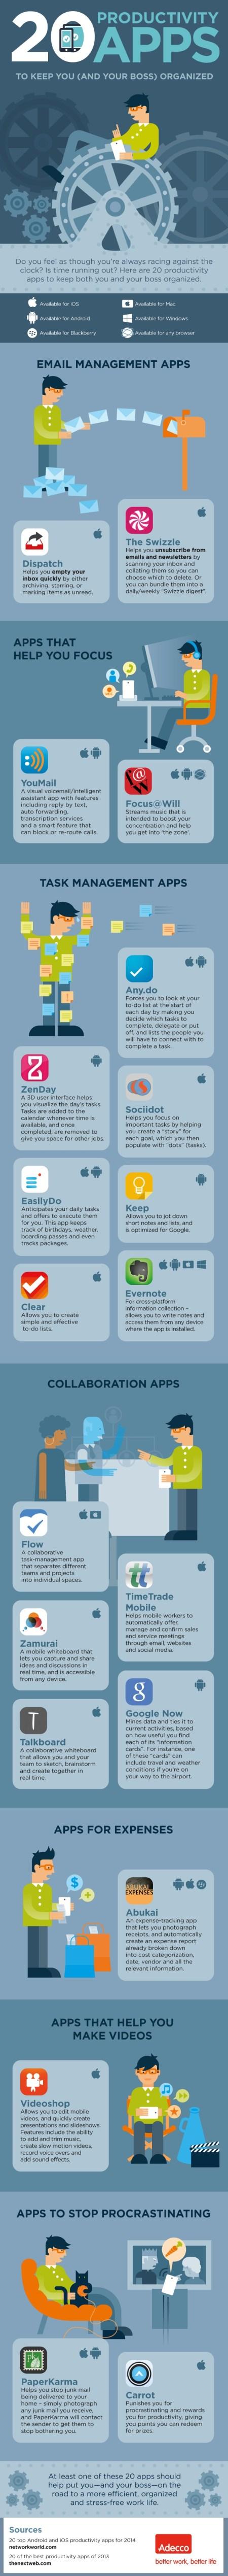 productivity apps - productivity-apps